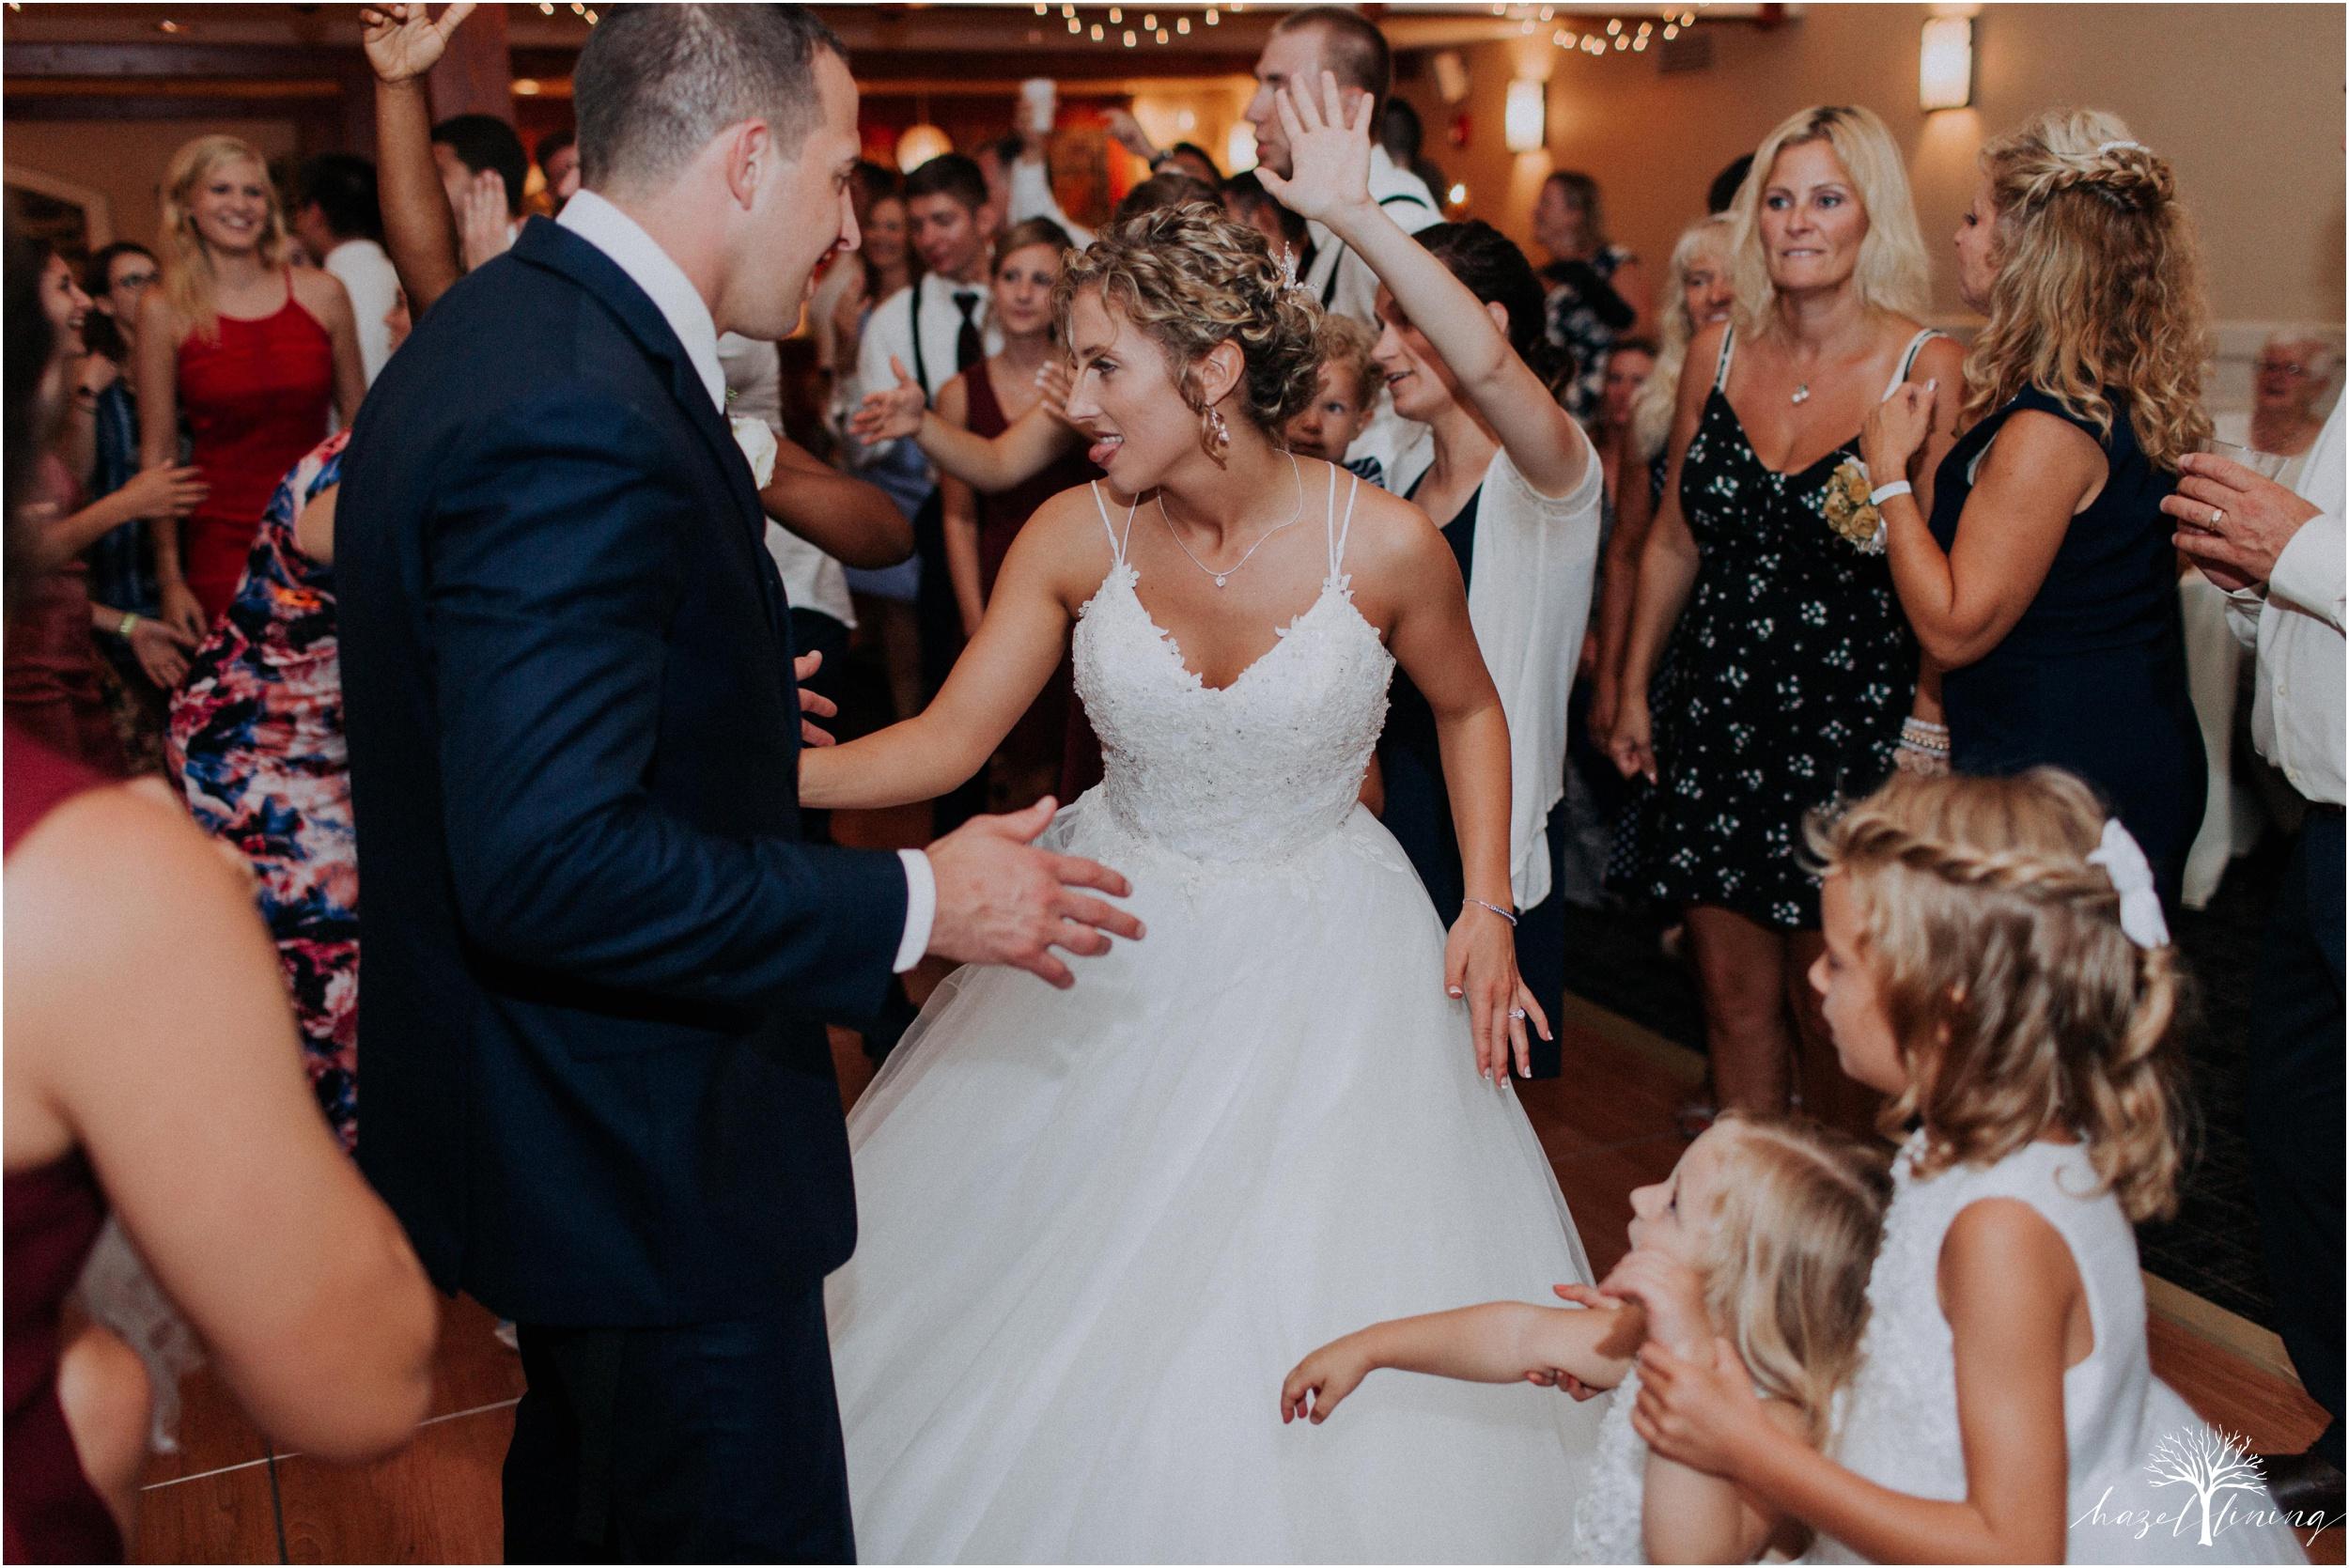 jonathan-weibel-becky-haywood-loft-at-sweetwater-cc-pennsburg-pennsylvania-rainy-day-summer-wedding-hazel-lining-travel-wedding-elopement-photography_0145.jpg